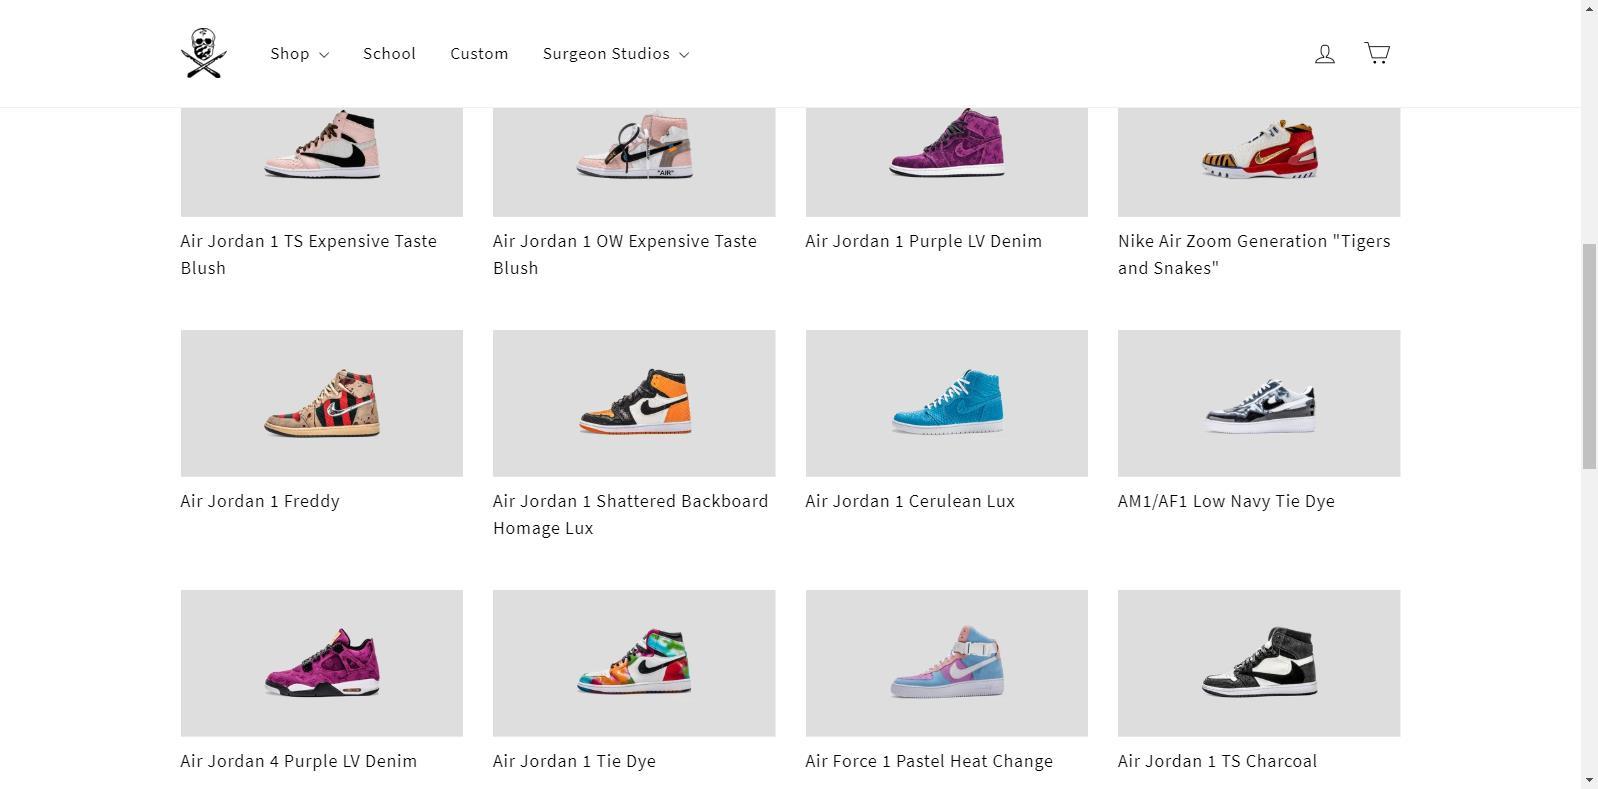 Air Jordan 1,AJ1,The Shoe Surg 拆限量 LV 做鞋,全球就他们一家!Drake、韦德都是忠实顾客!